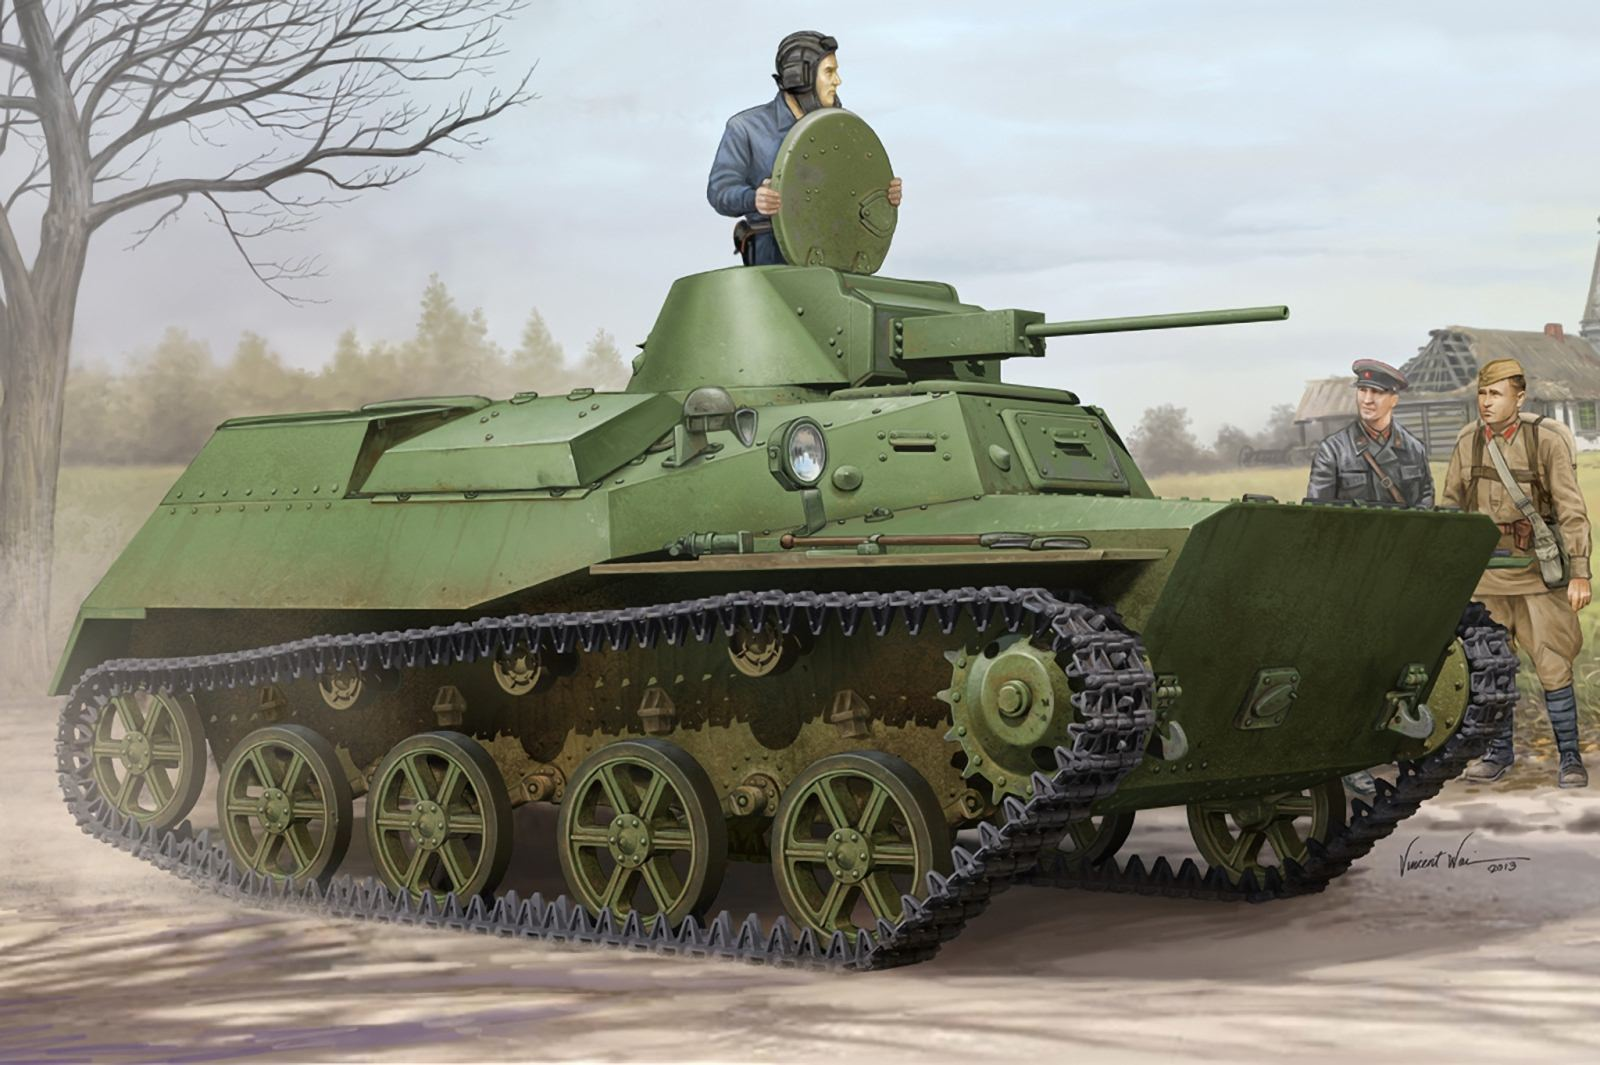 1929. Т-30 - тяжелый танк прорыва (проект)